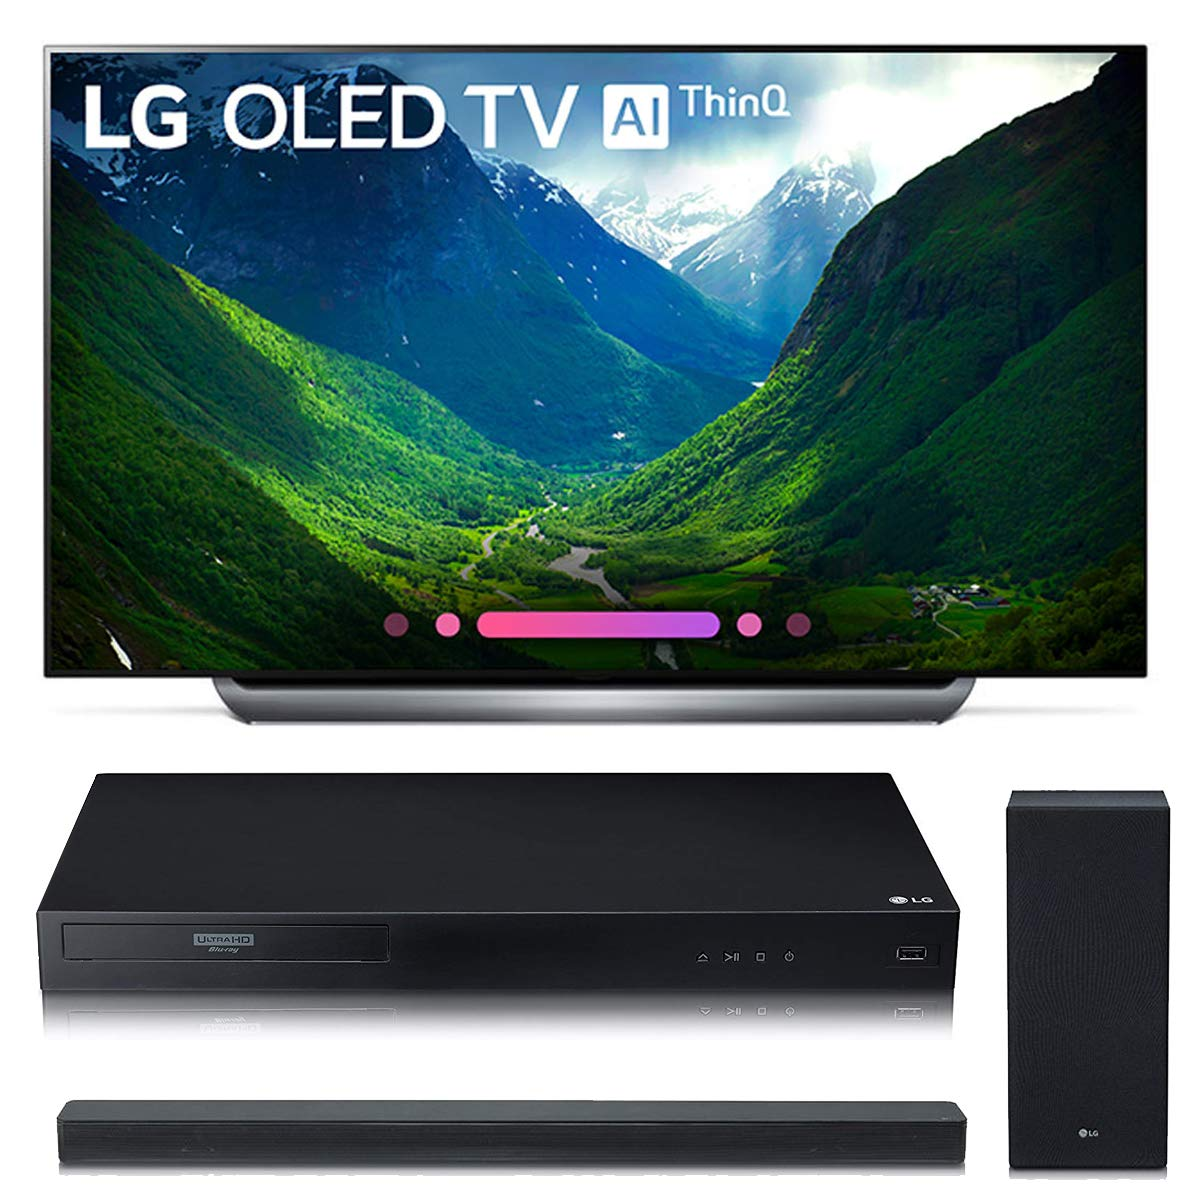 LG Electronics OLED65C8P 65-Inch 4K Ultra HD Smart OLED TV (2018 Model) Bundle with LG UBK80 4K and LG SK6Y 2.1